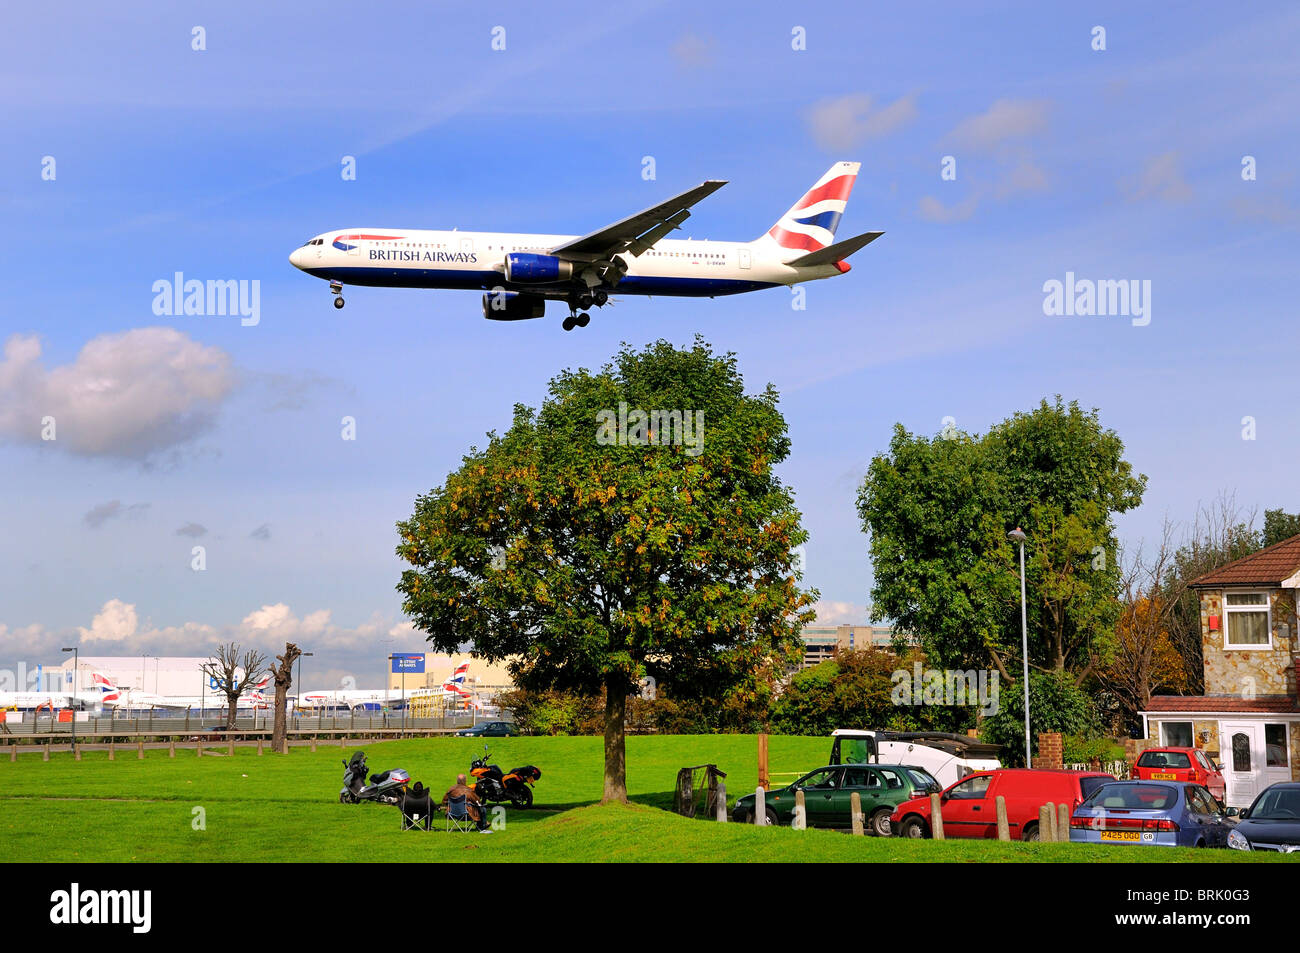 Low flying passenger aircraft landing at Heathrow  airport, London Stock Photo